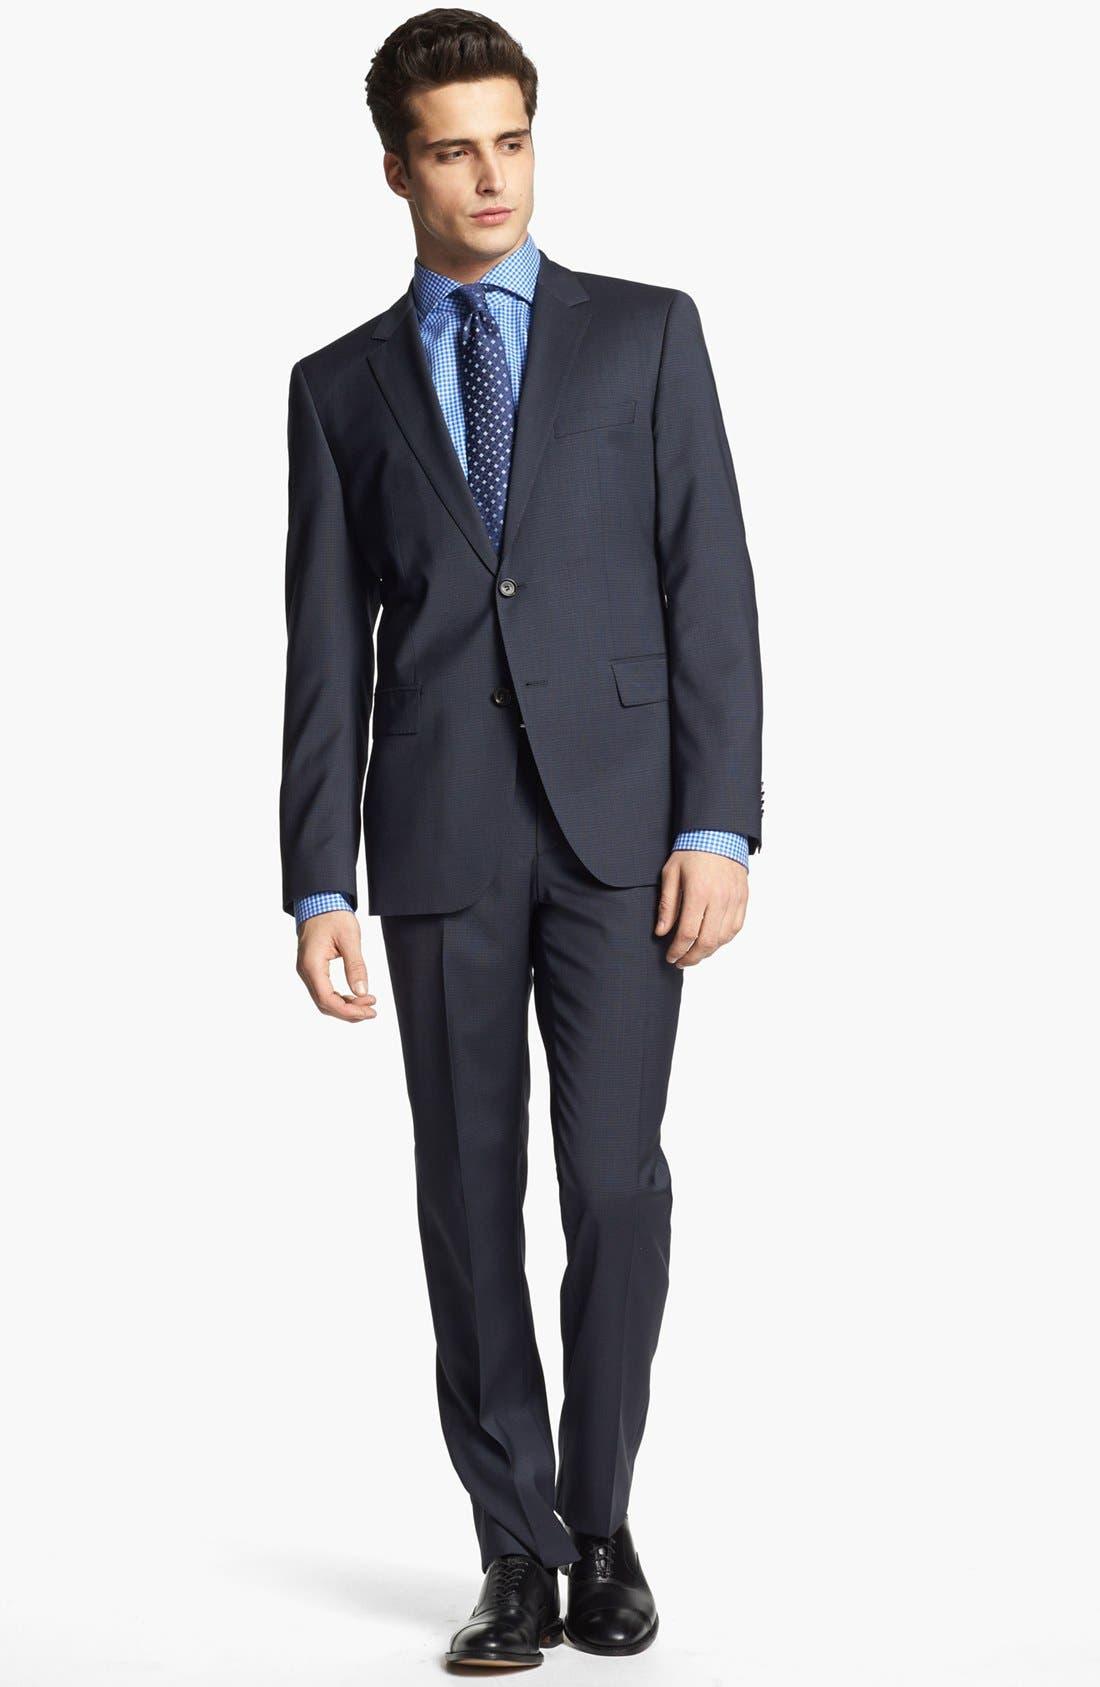 Main Image - BOSS HUGO BOSS 'James/Sharp' Trim Fit Check Suit